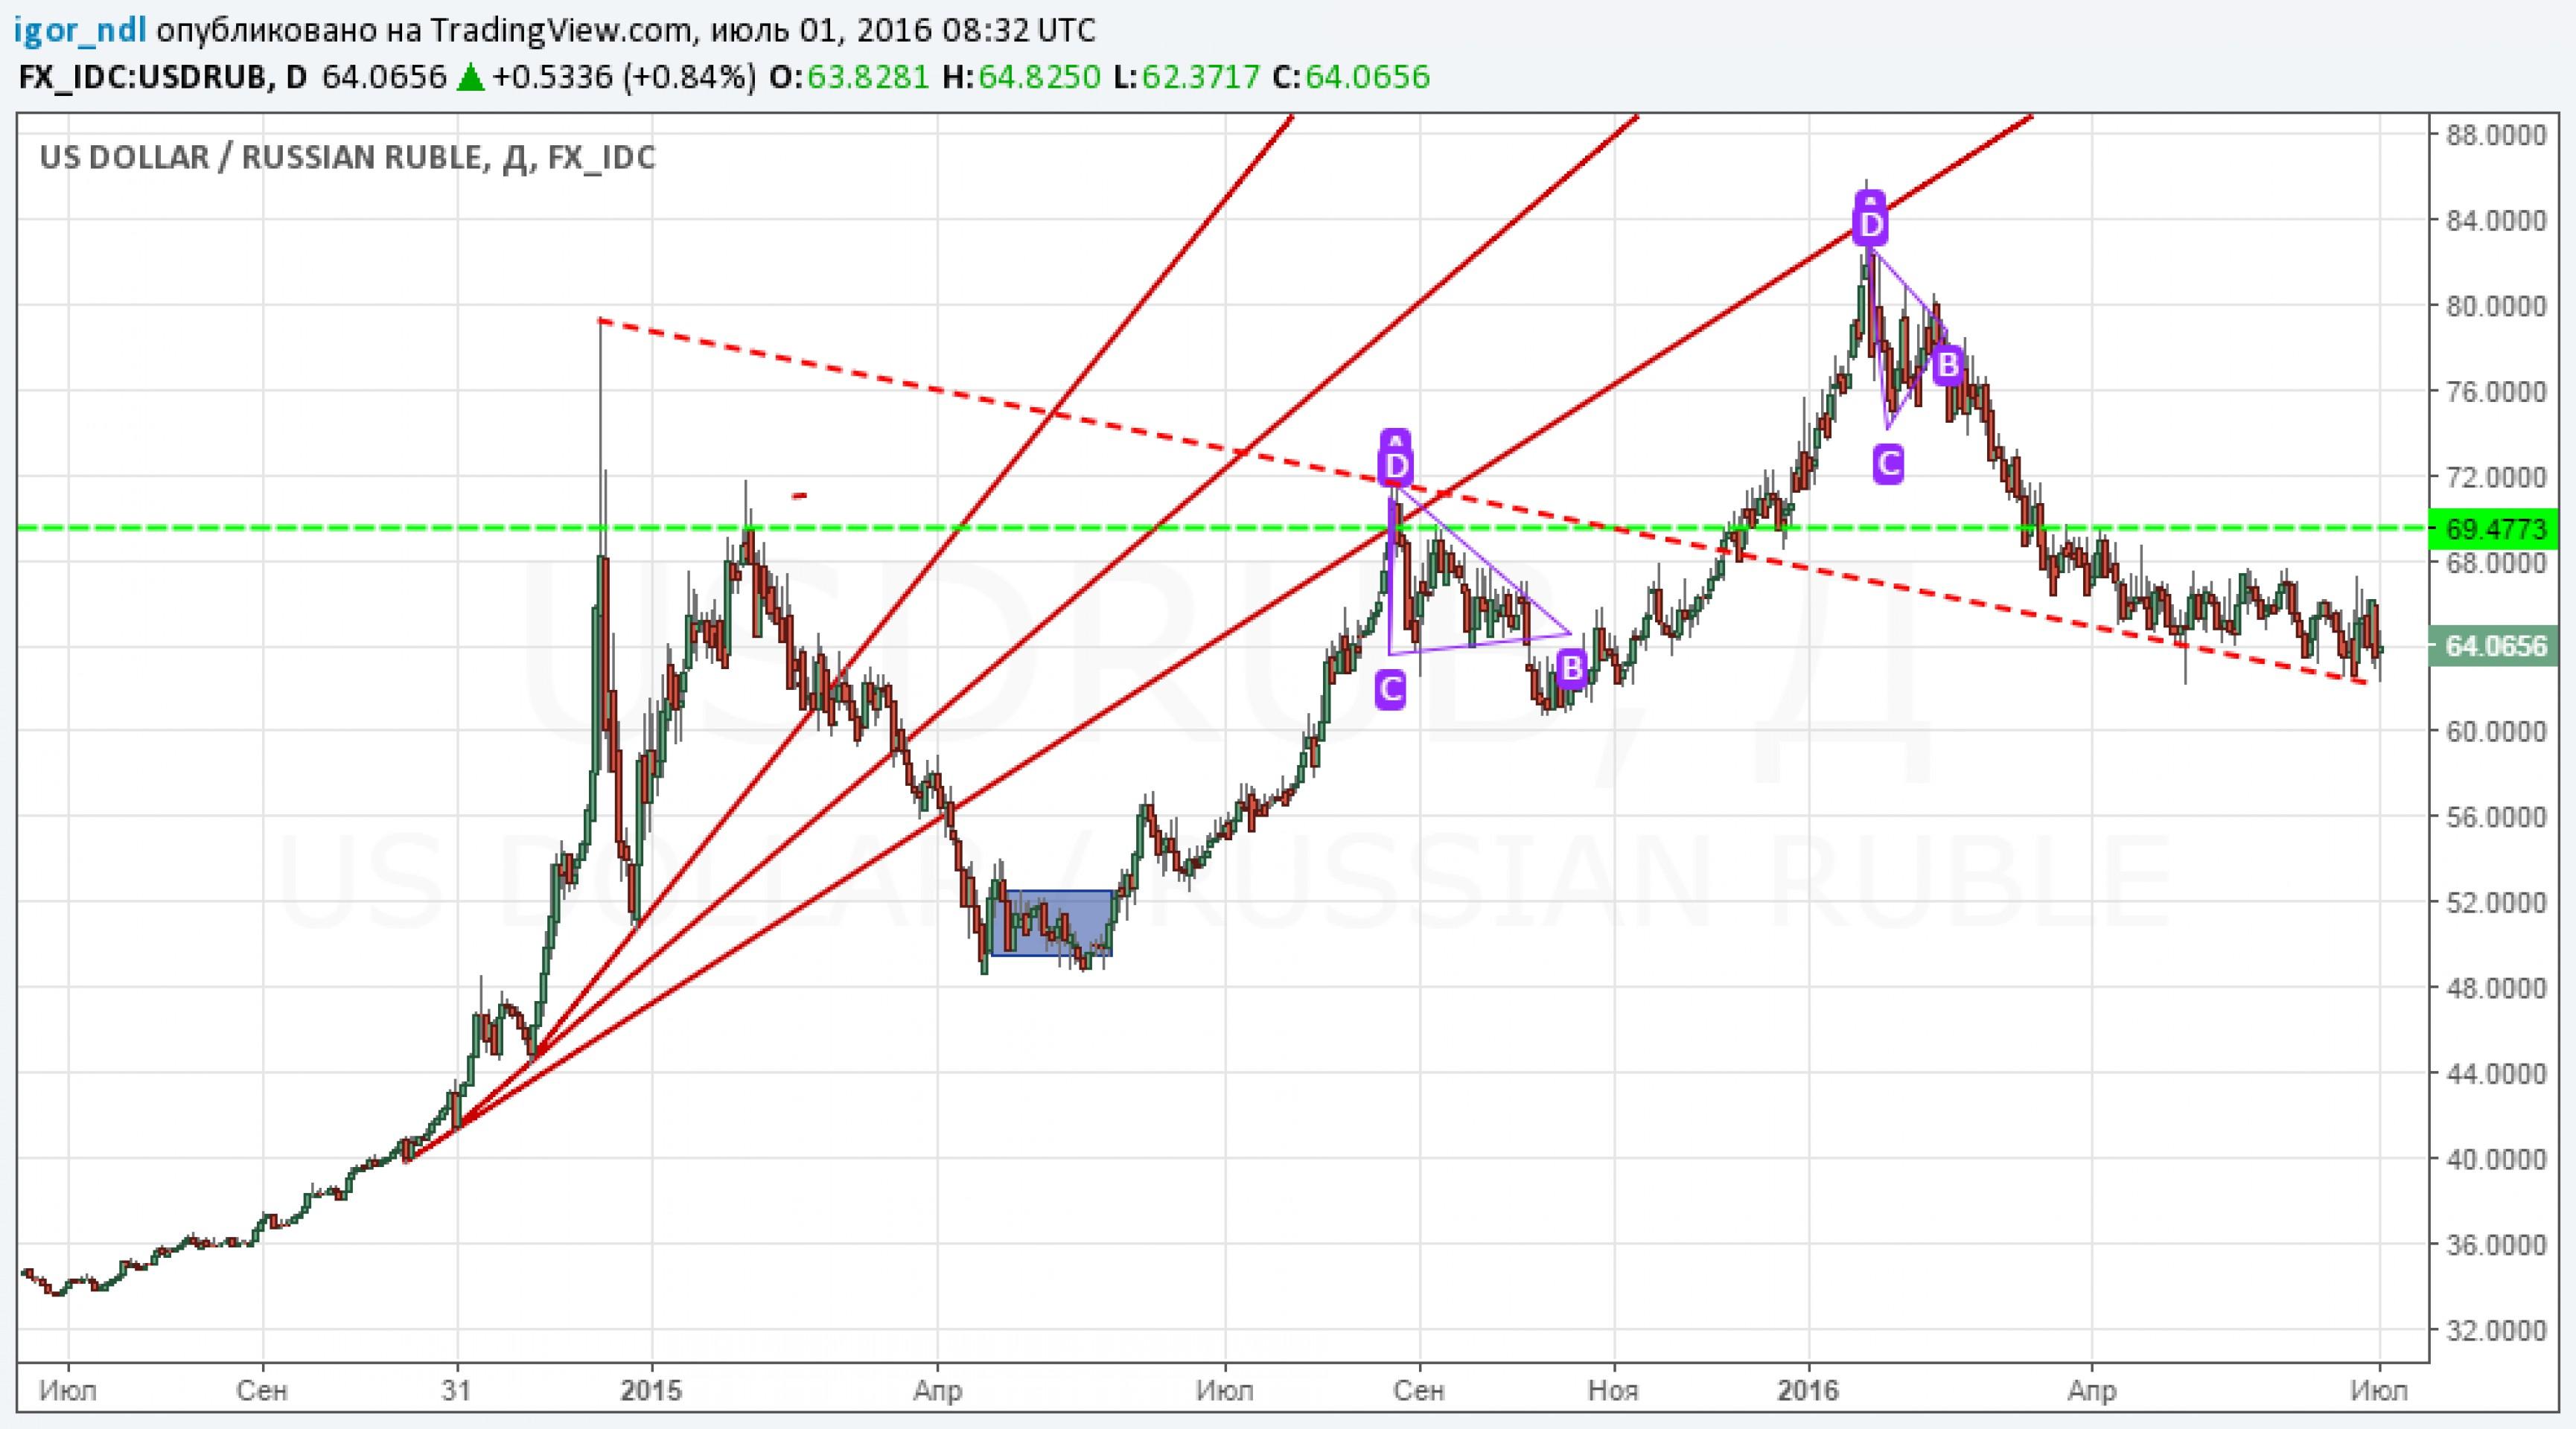 Рубль: каковы перспективы на ближайшие месяцы?